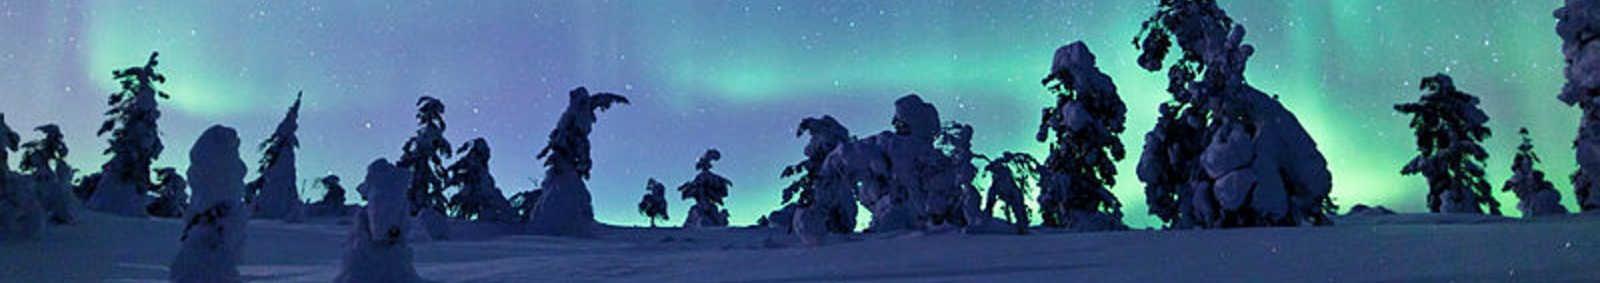 The Aurora on the horizon, Torasseippi. Finland